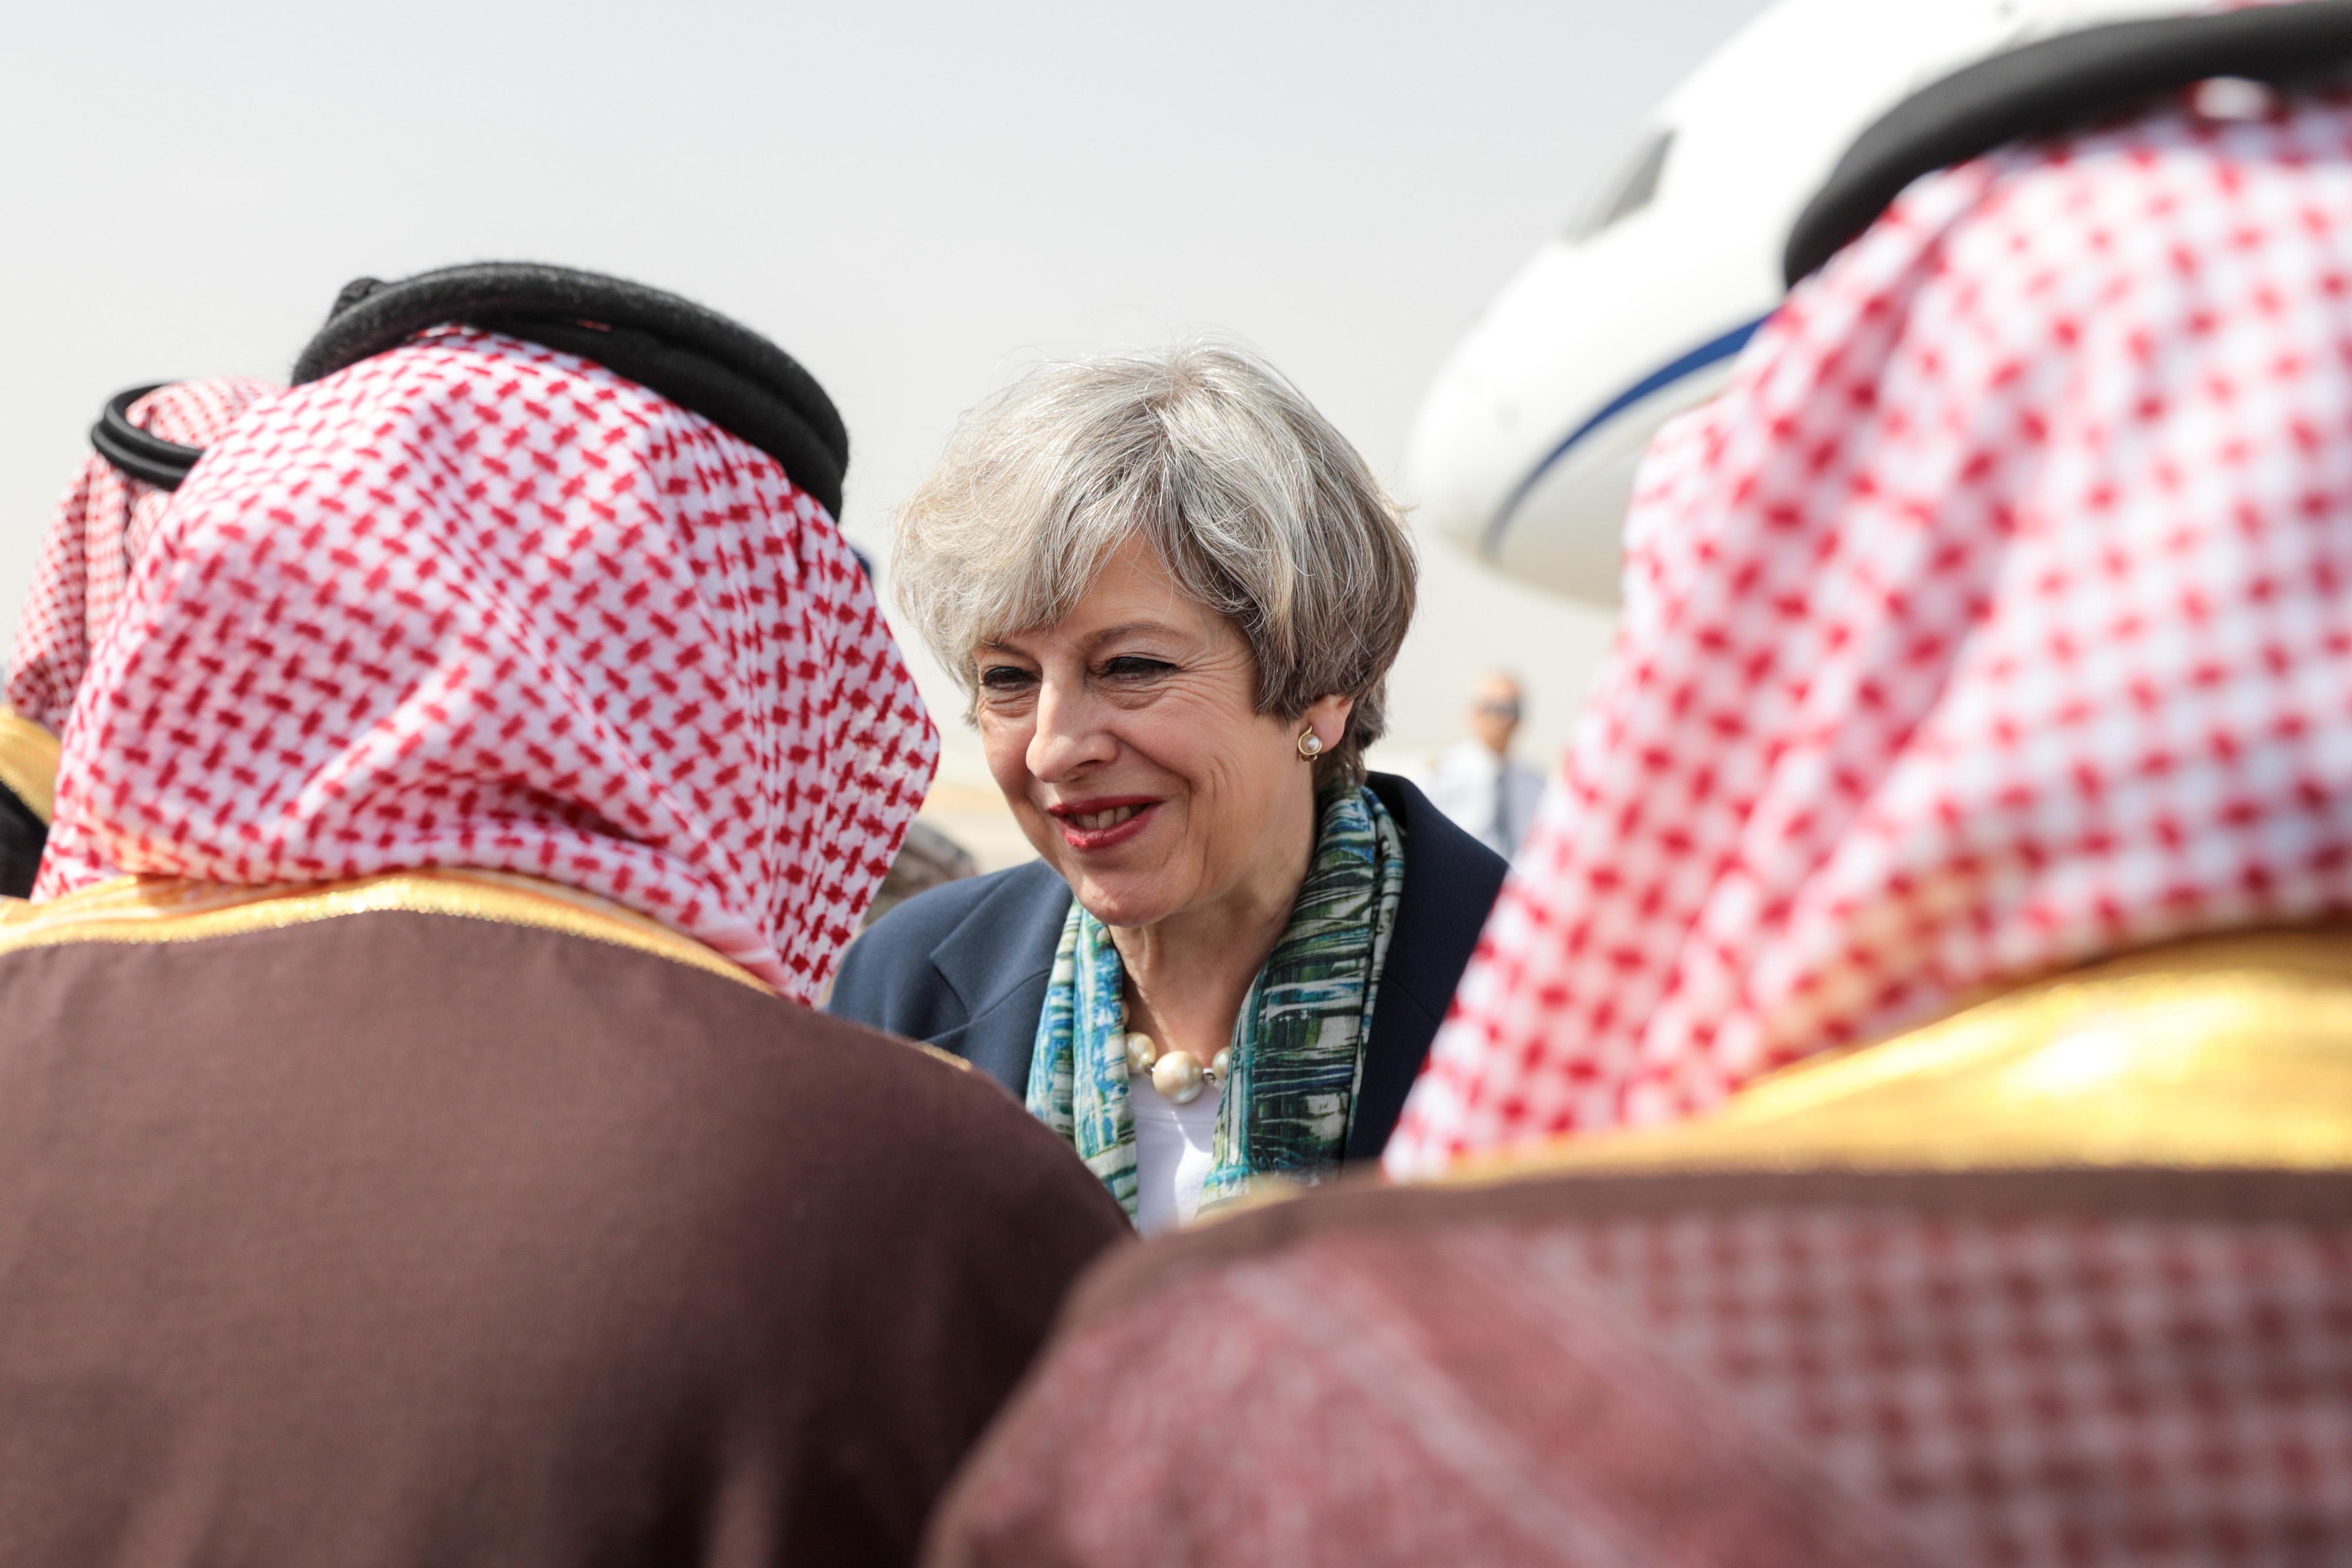 U.K. Prime Minister Theresa May Visits Jordan And Saudi Arabia To Promote Trade And Security